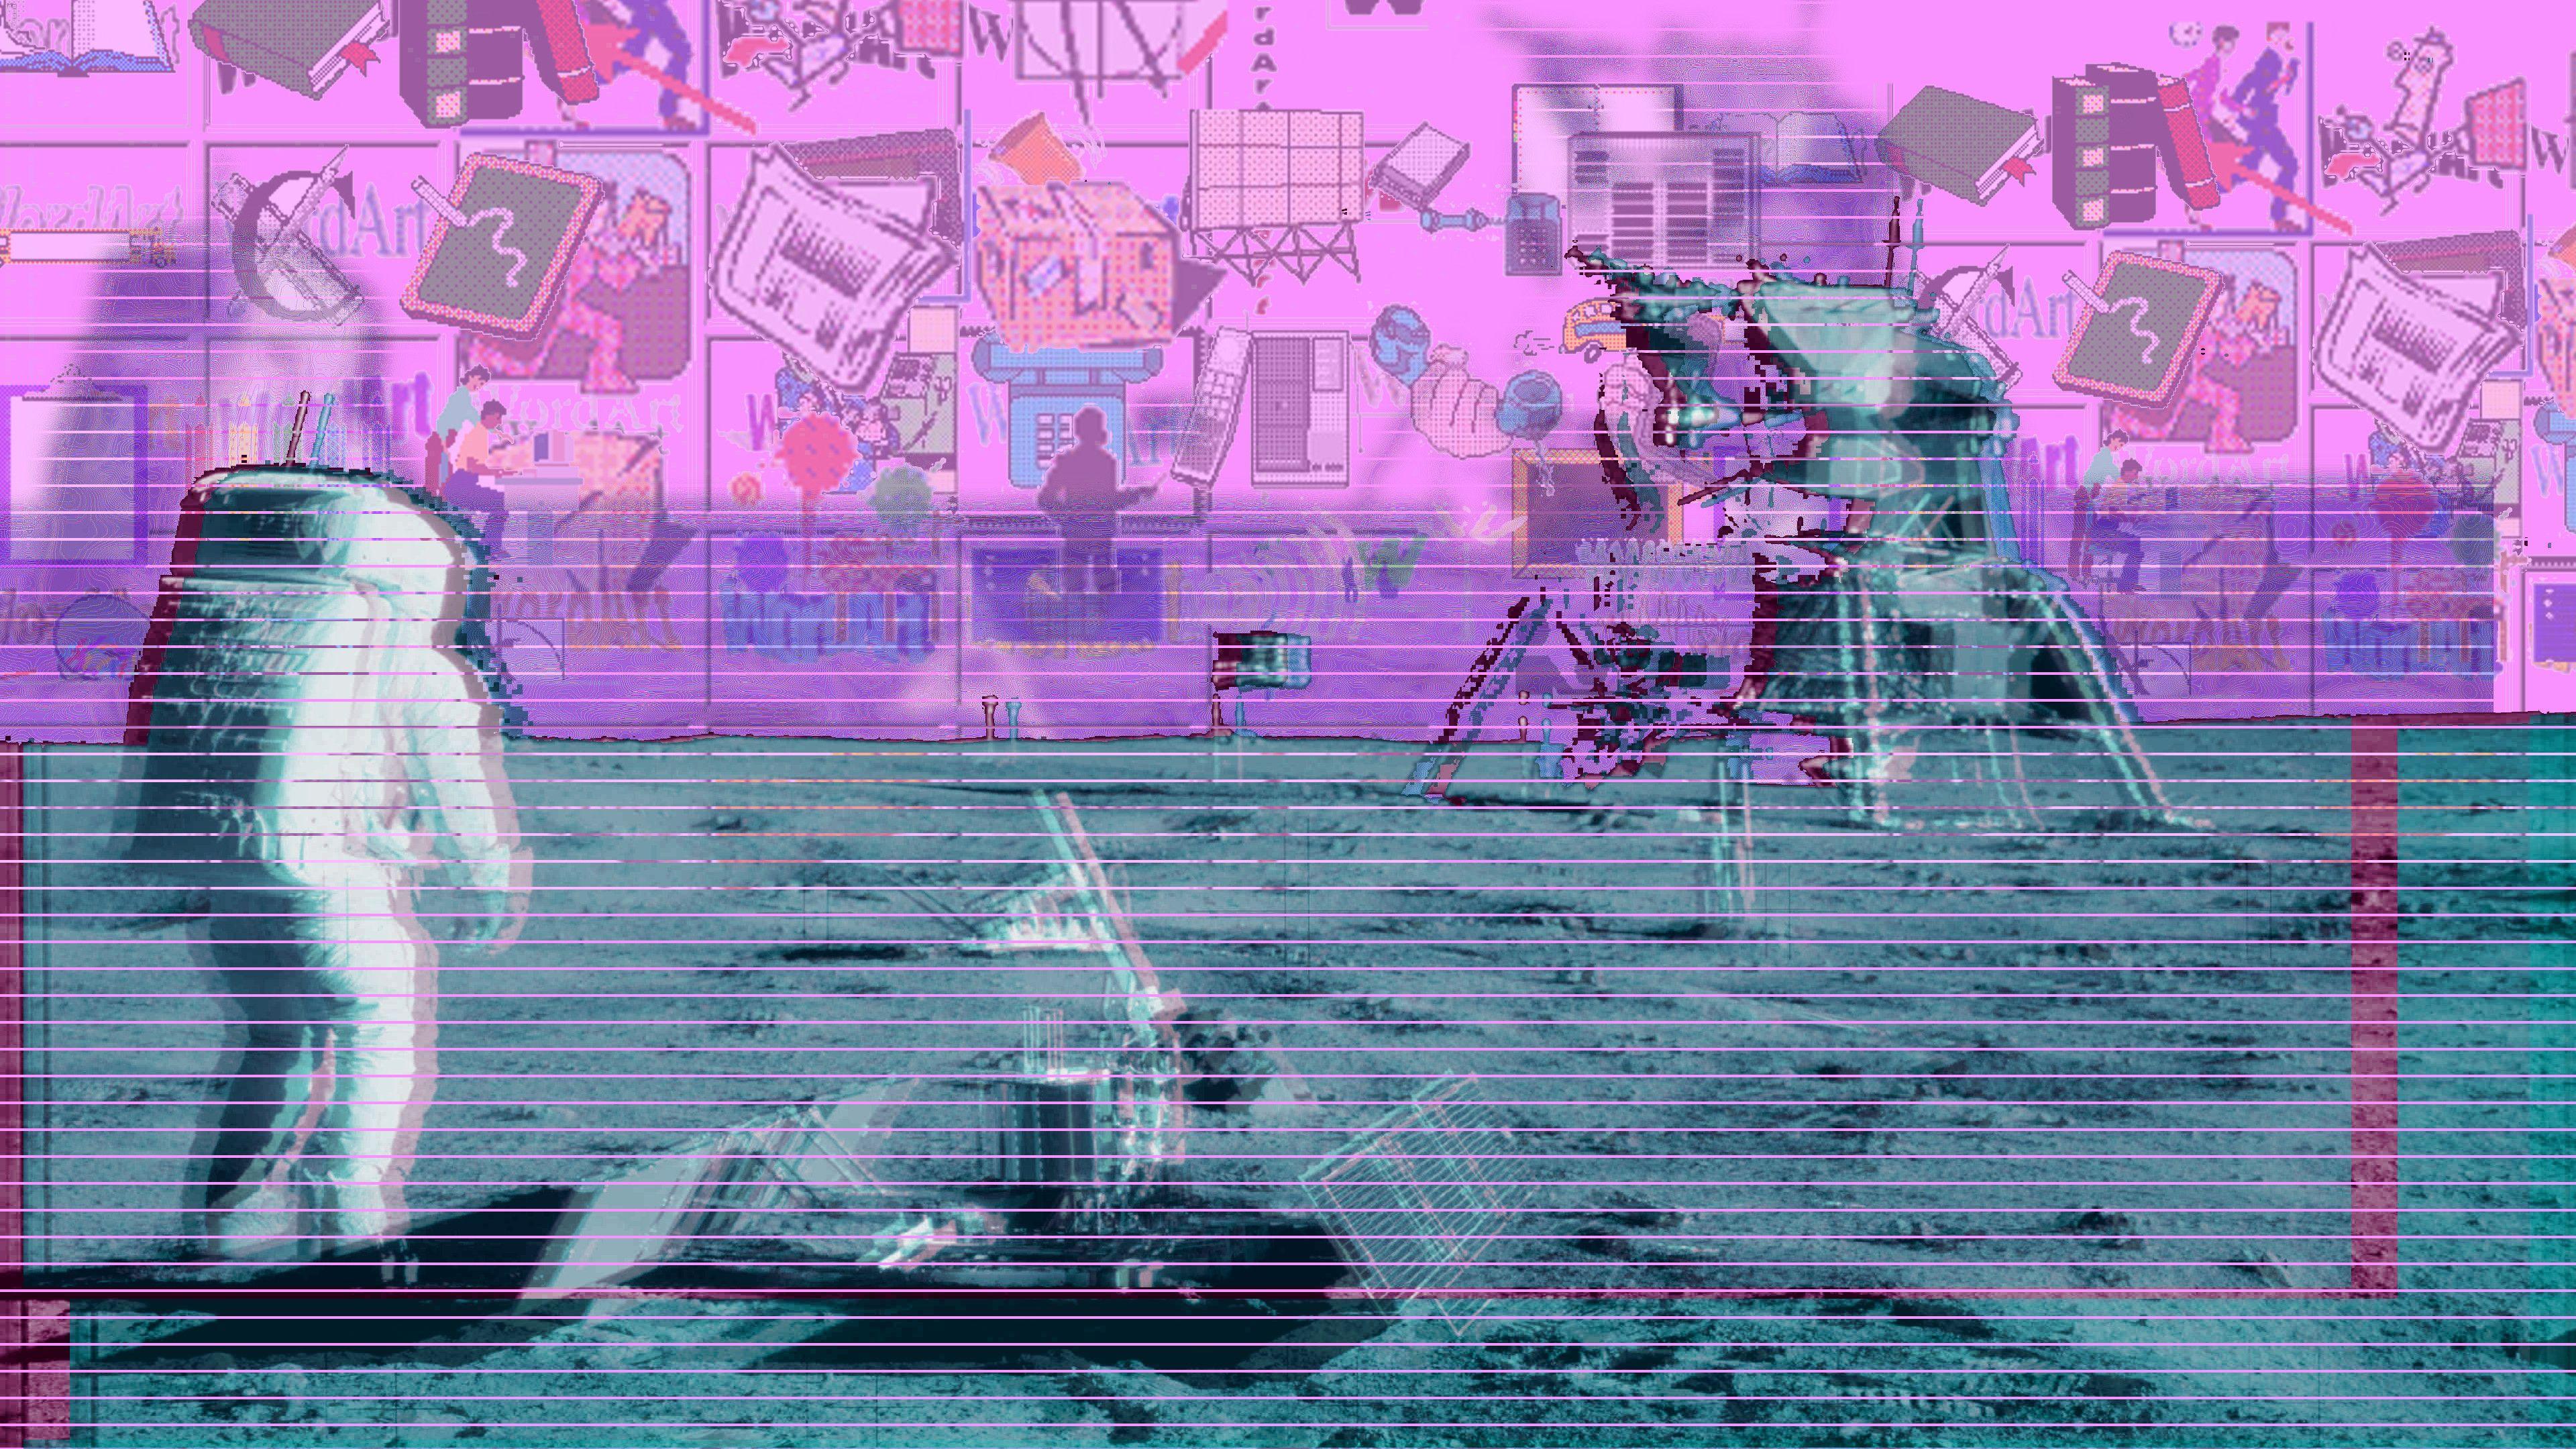 Vaporwave Aesthetic Wallpapers Wallpaper Cave